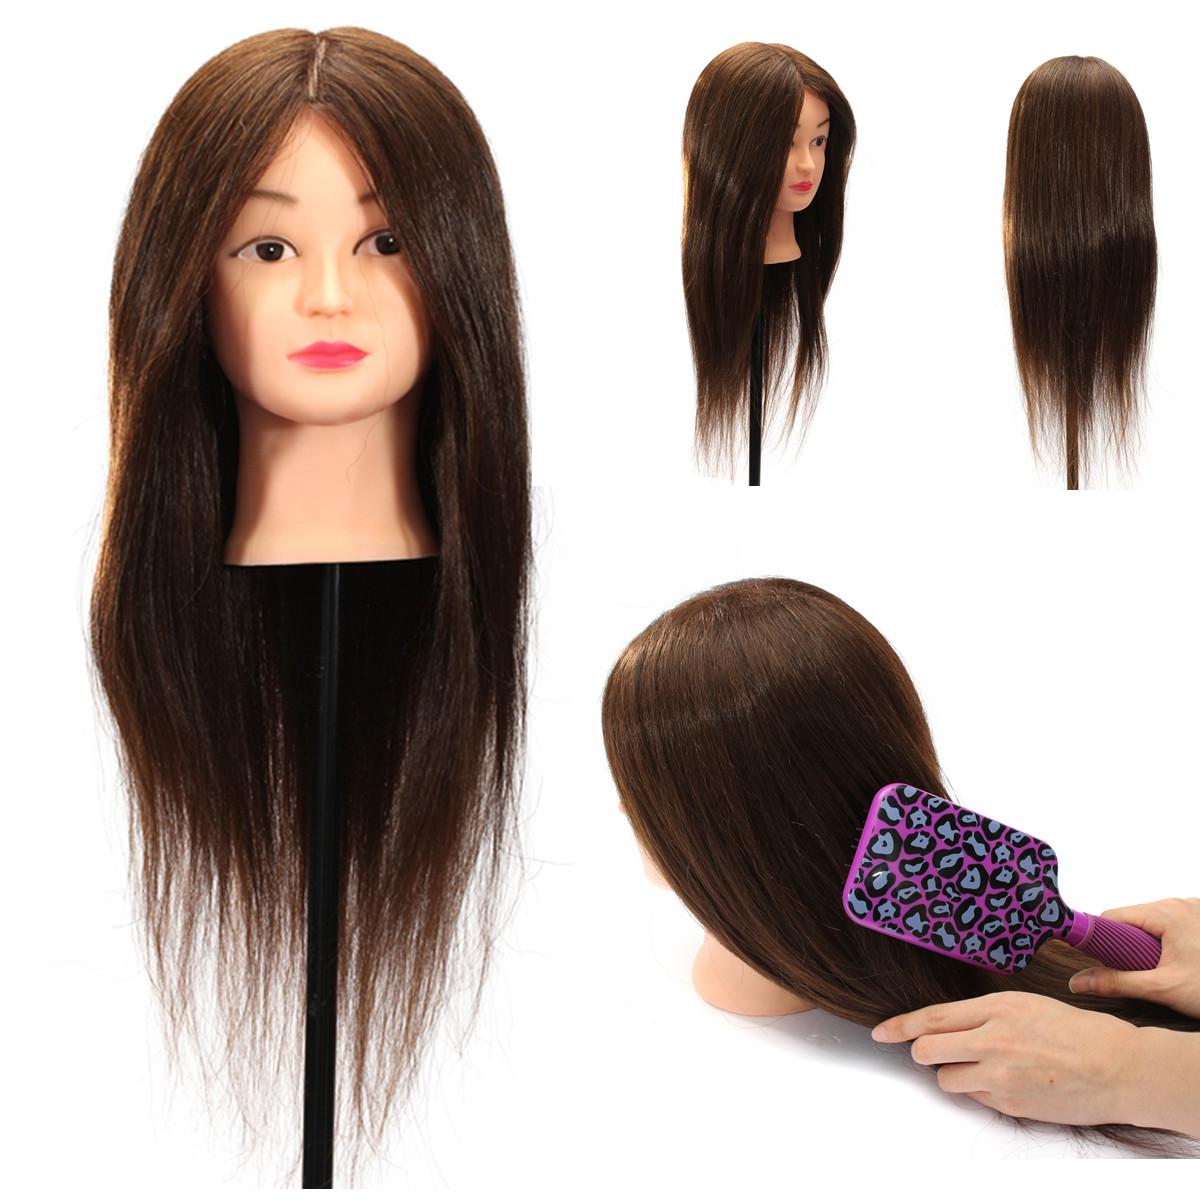 18 20 22 24 26 Hair Mannequin Cut Hairdressing Training Head Doll Clamp Ebay